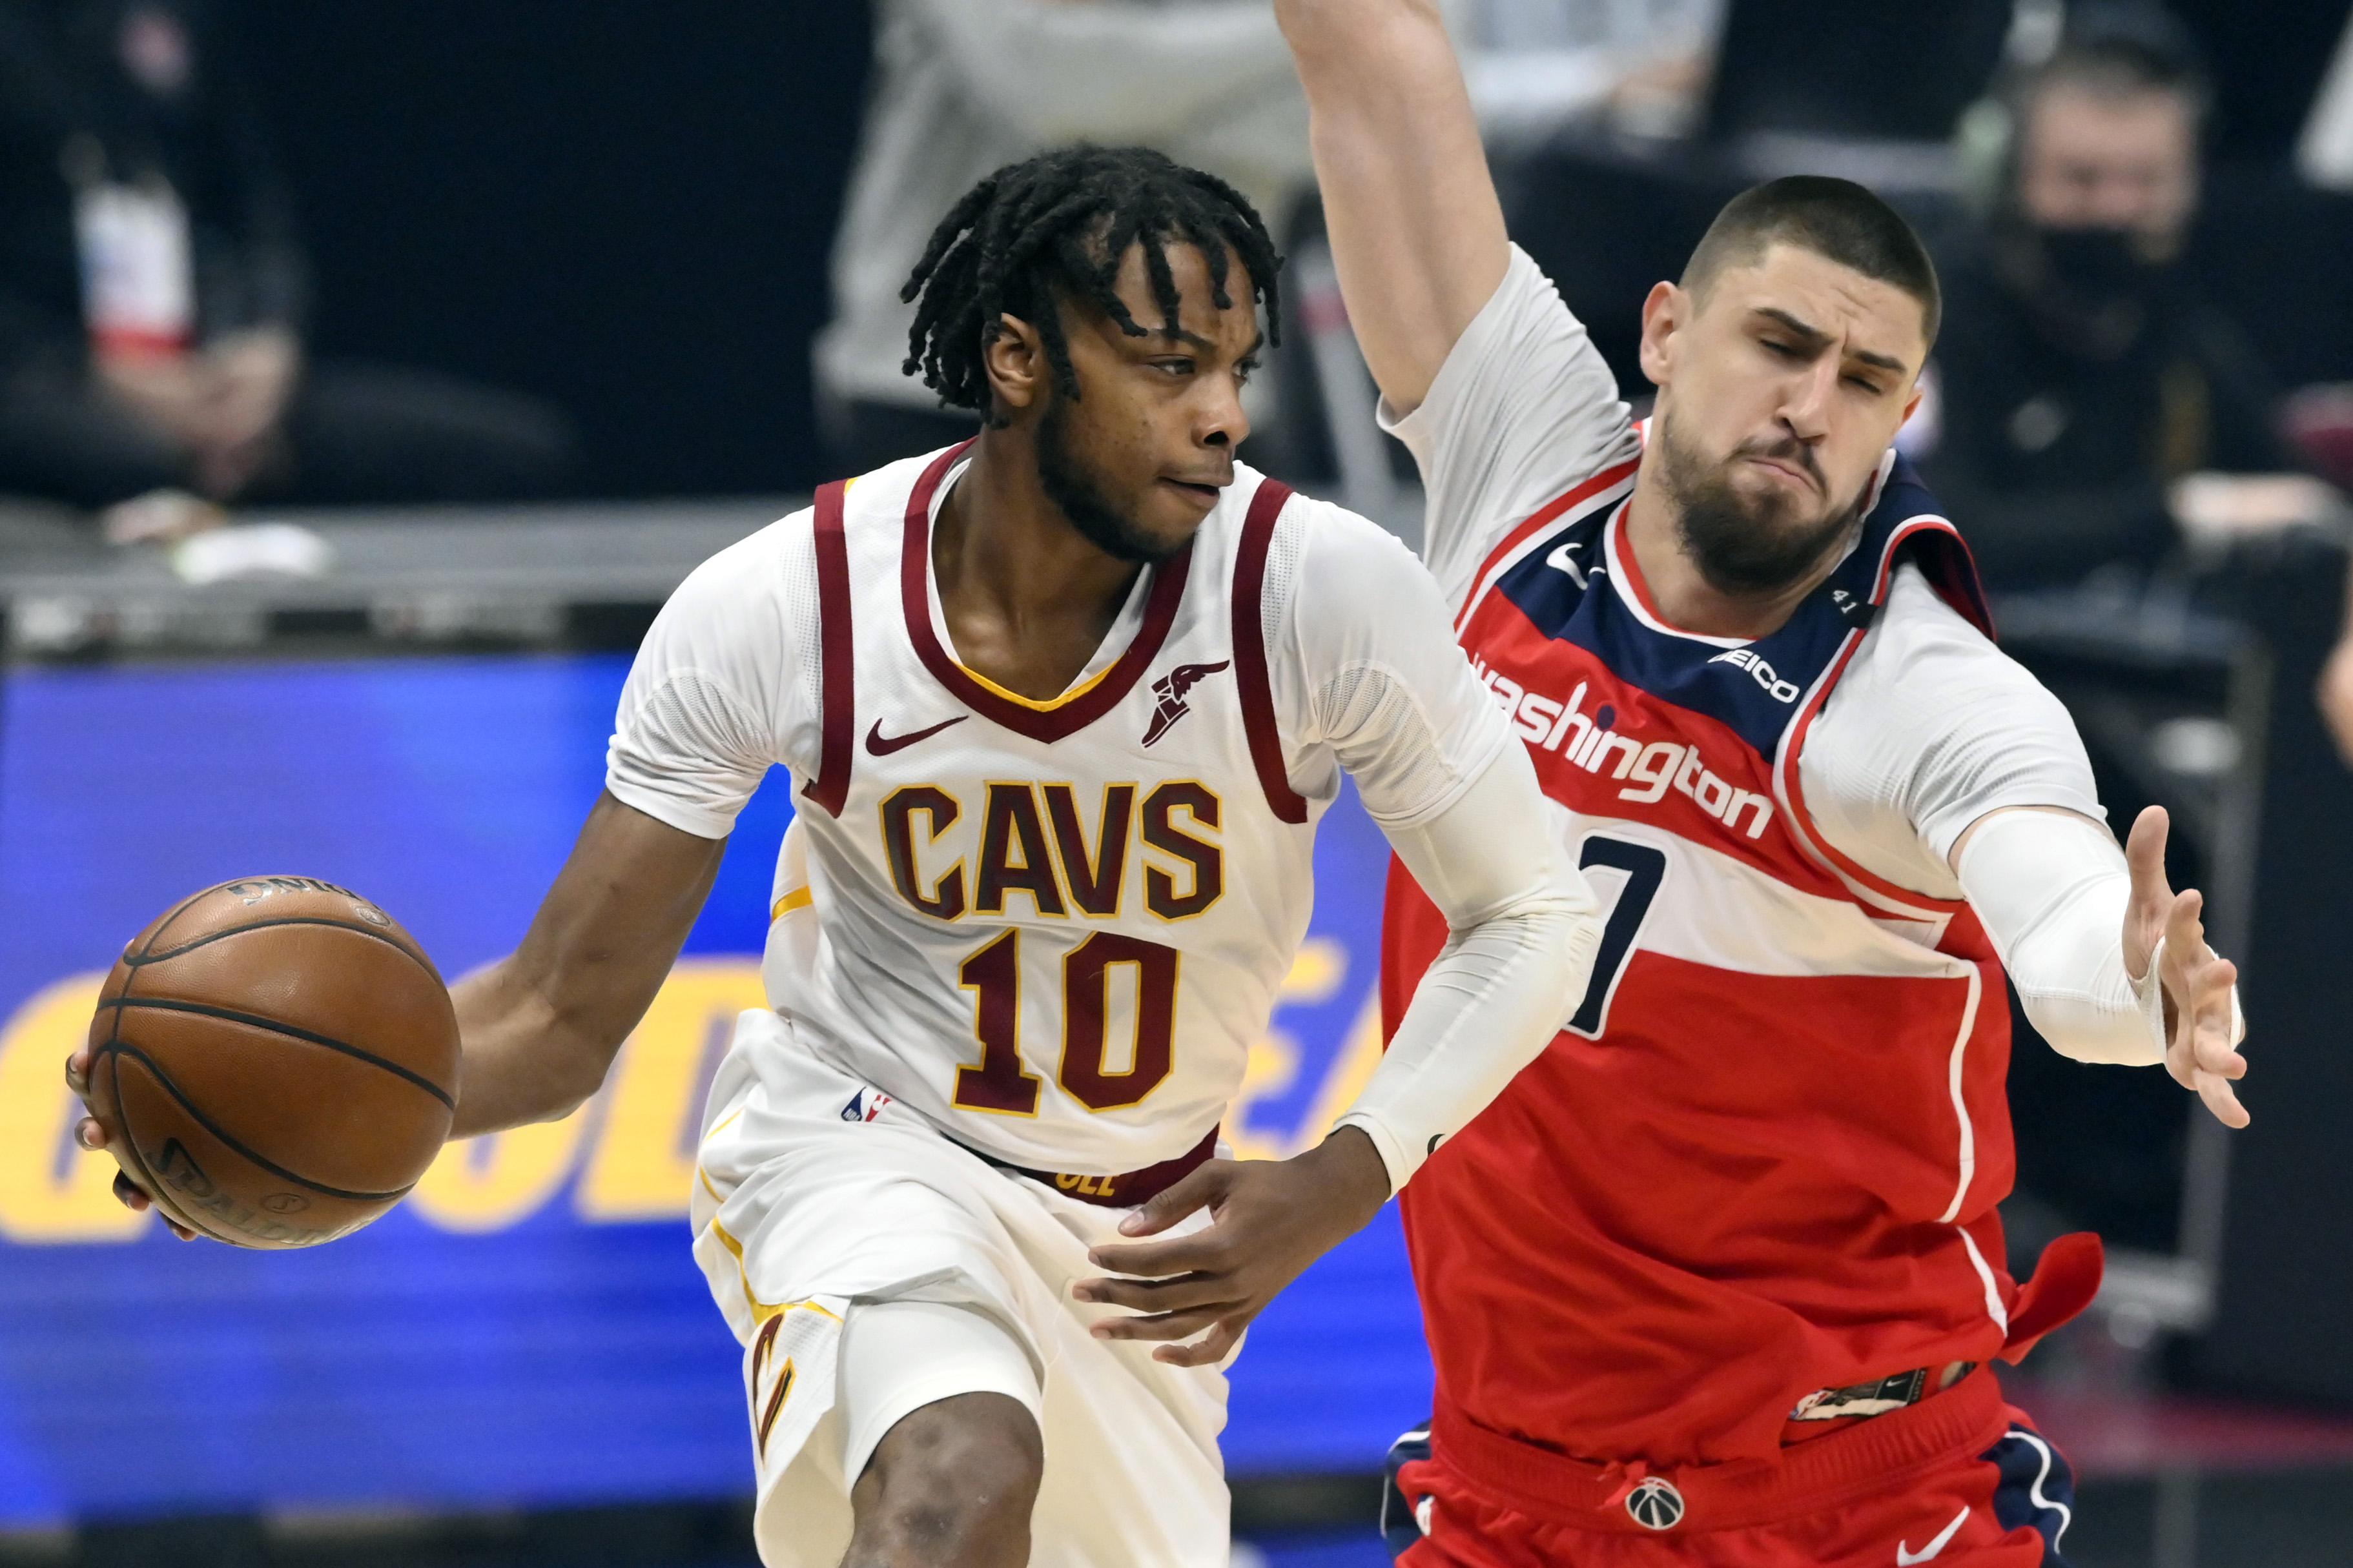 NBA: Washington Wizards at Cleveland Cavaliers